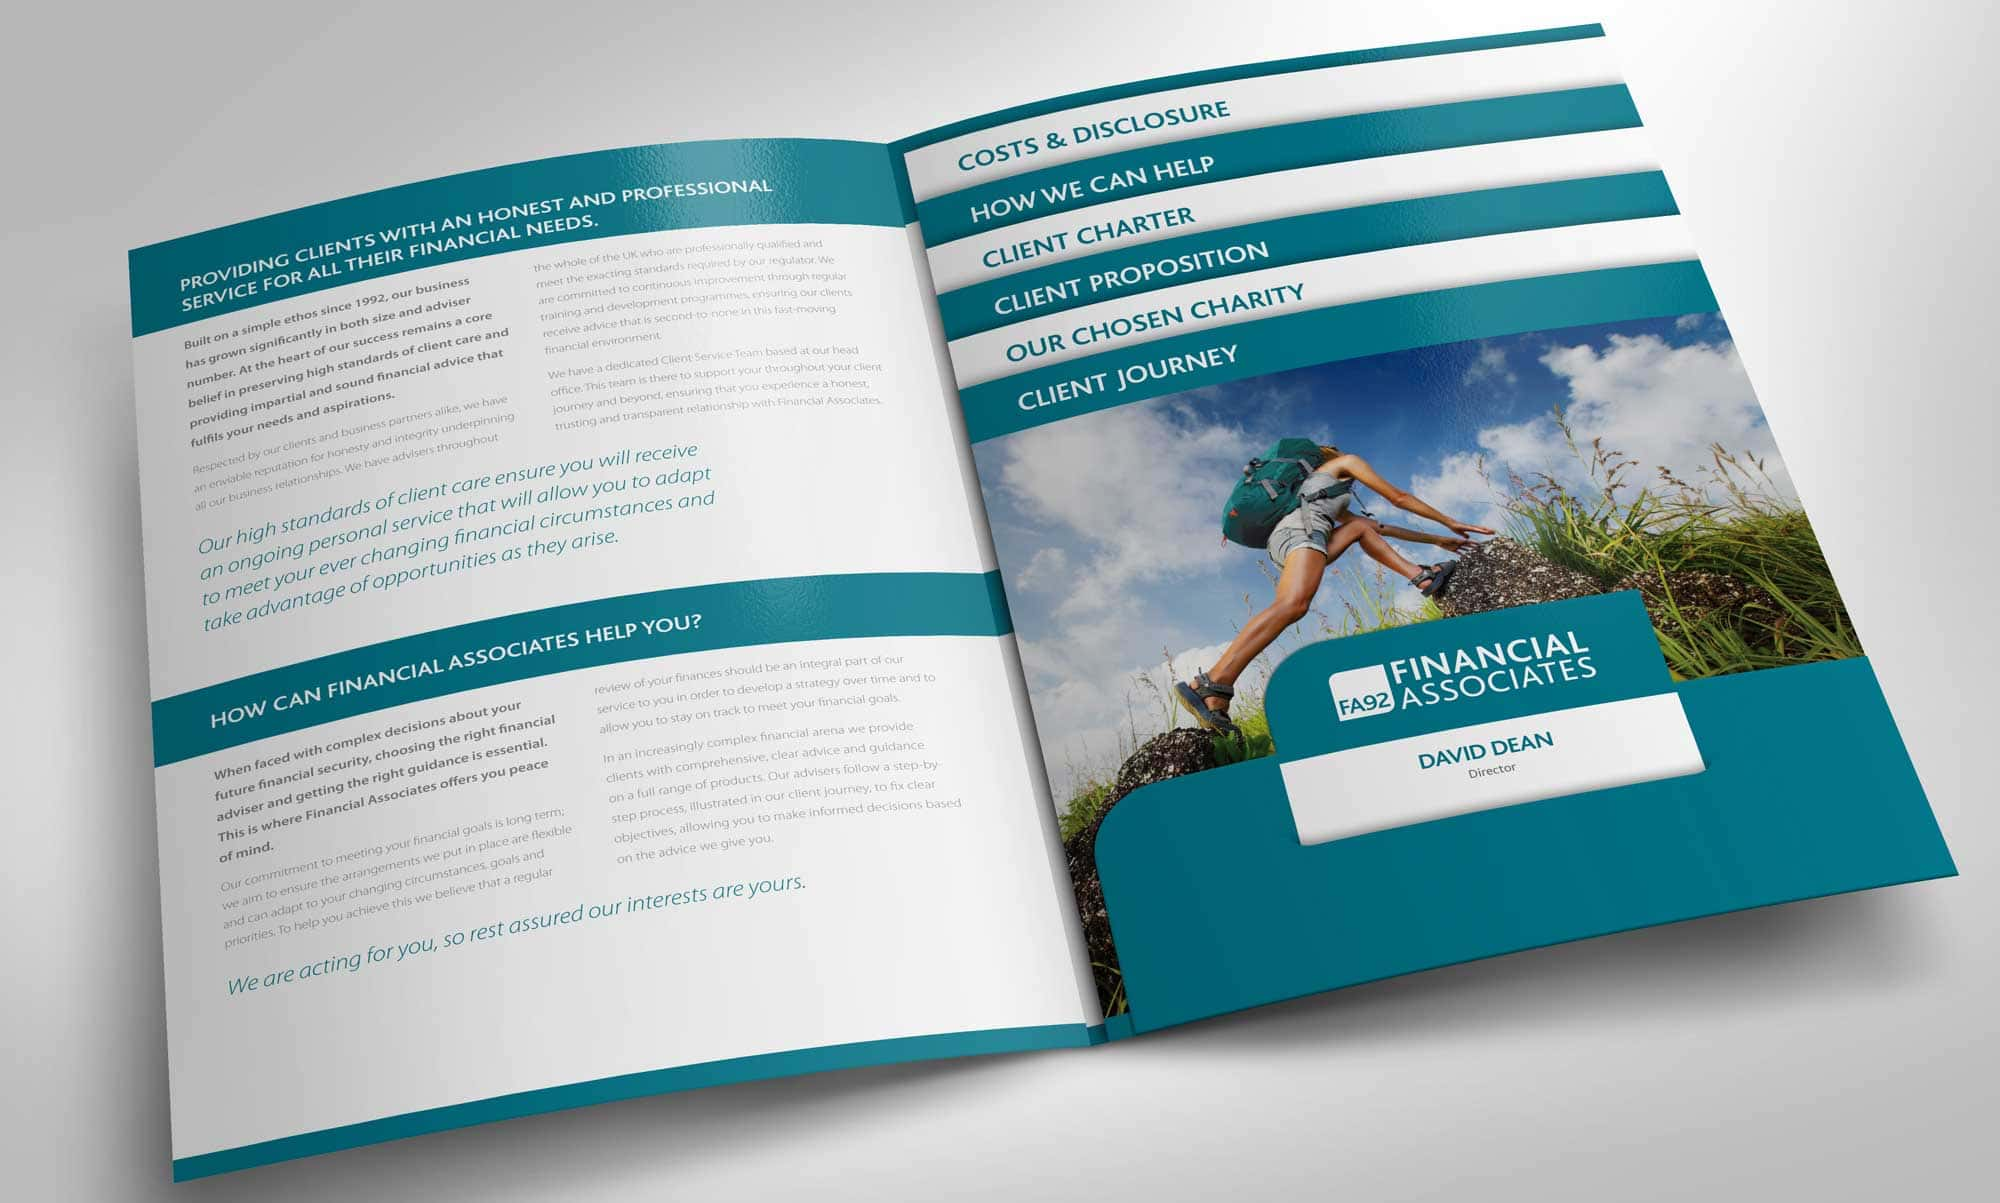 Bespoke Corporate Folder Design - FA92